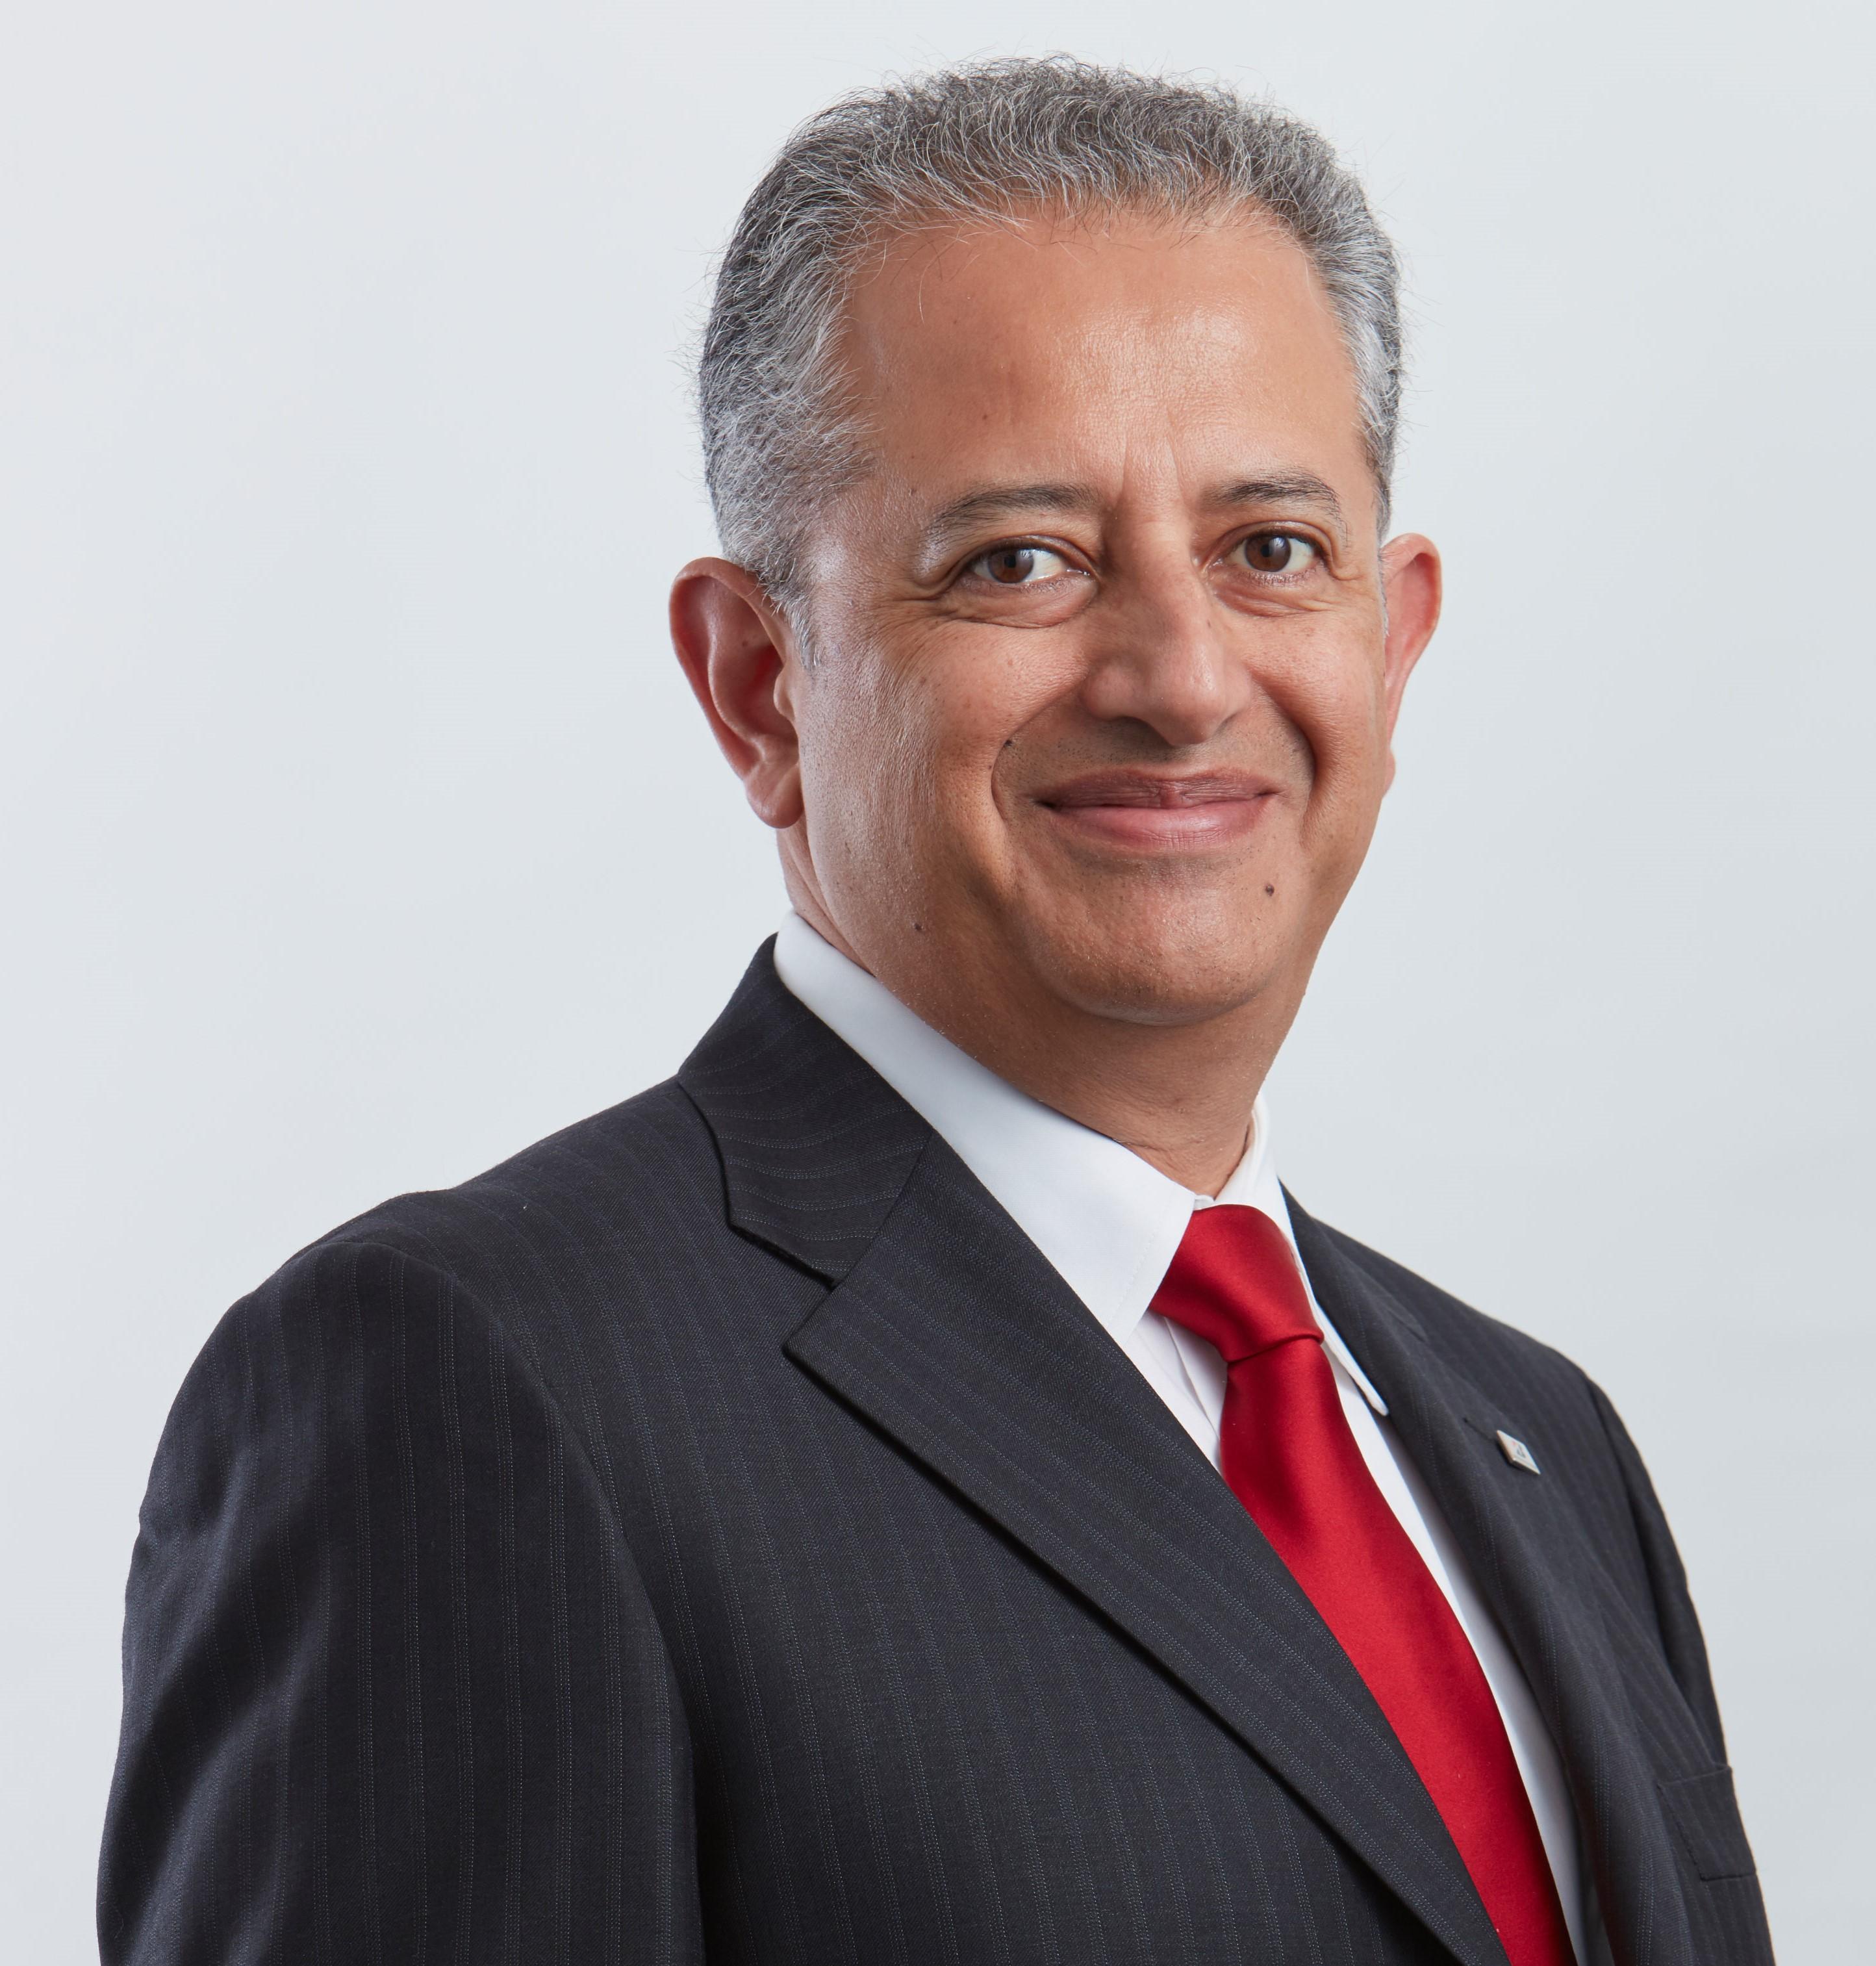 Bridgestone Americas Names a New Group President